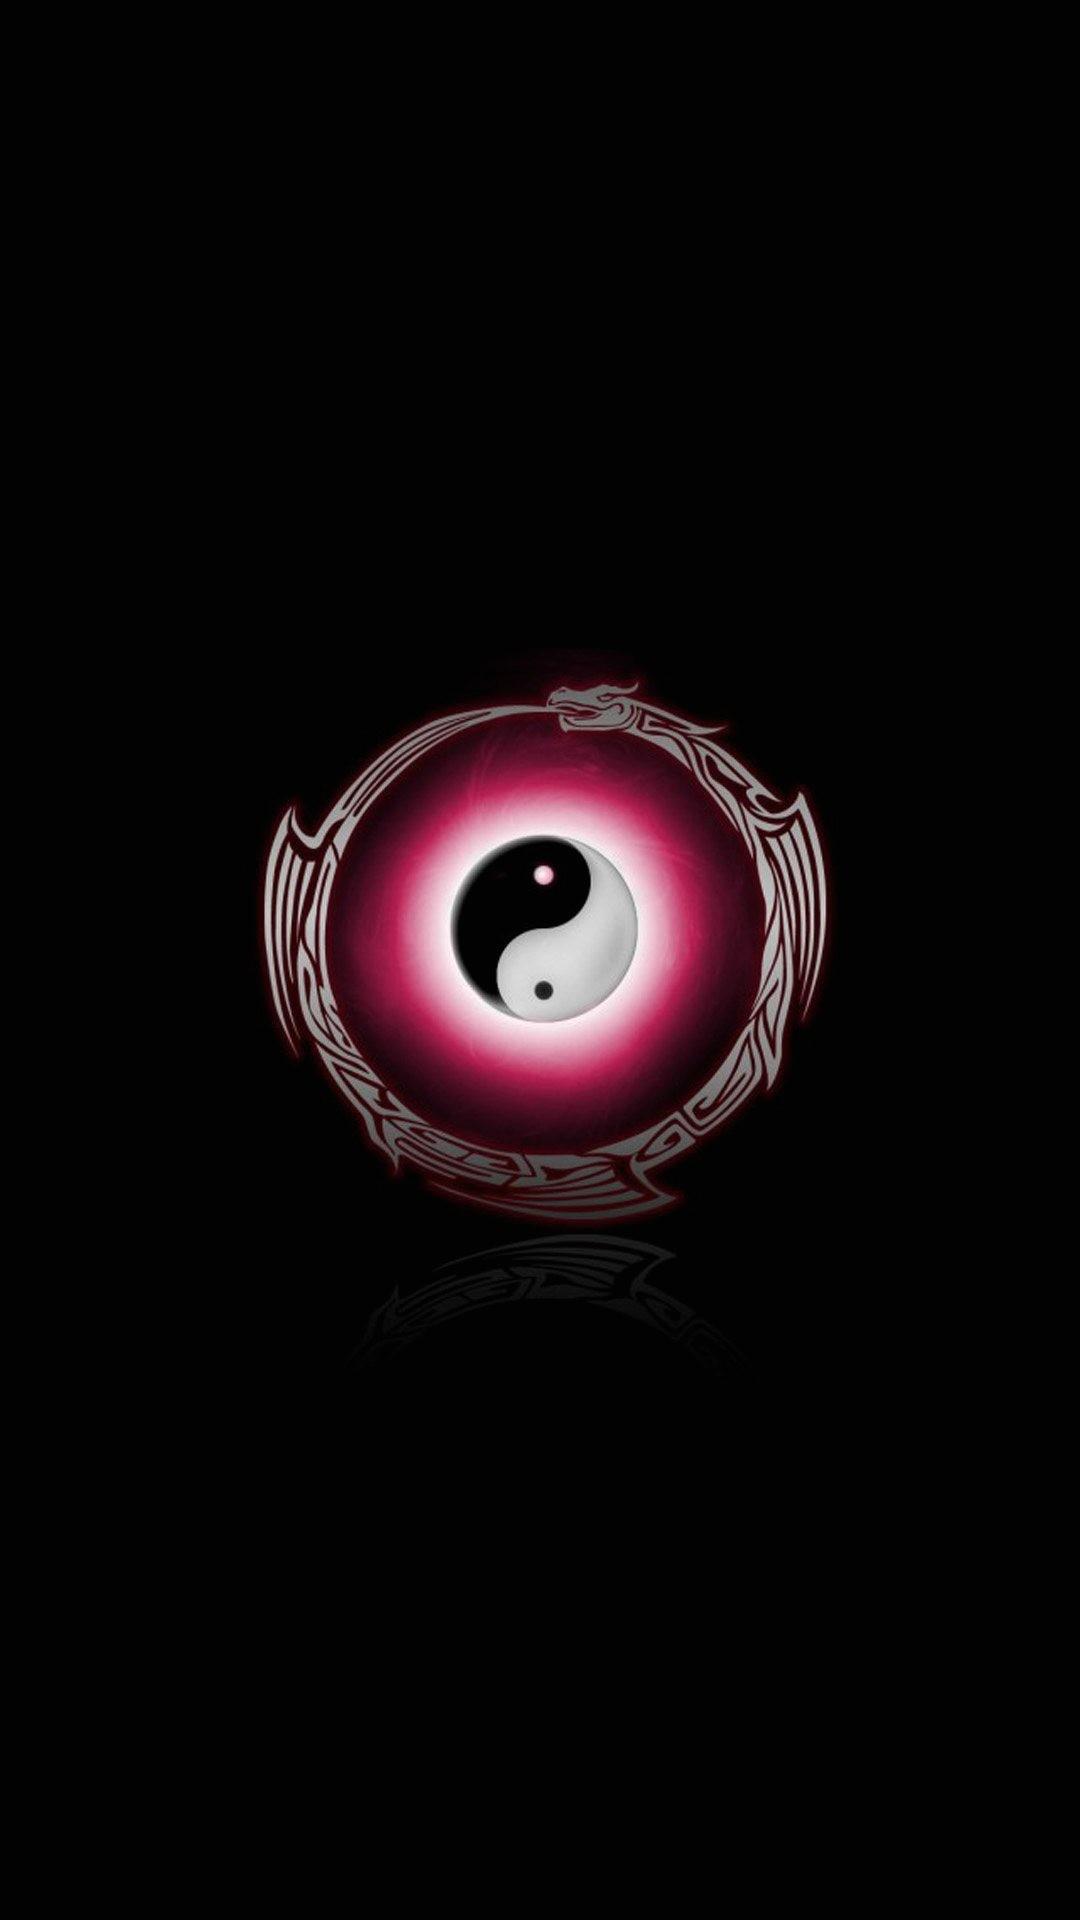 yin yang backgrounds (57+ images)